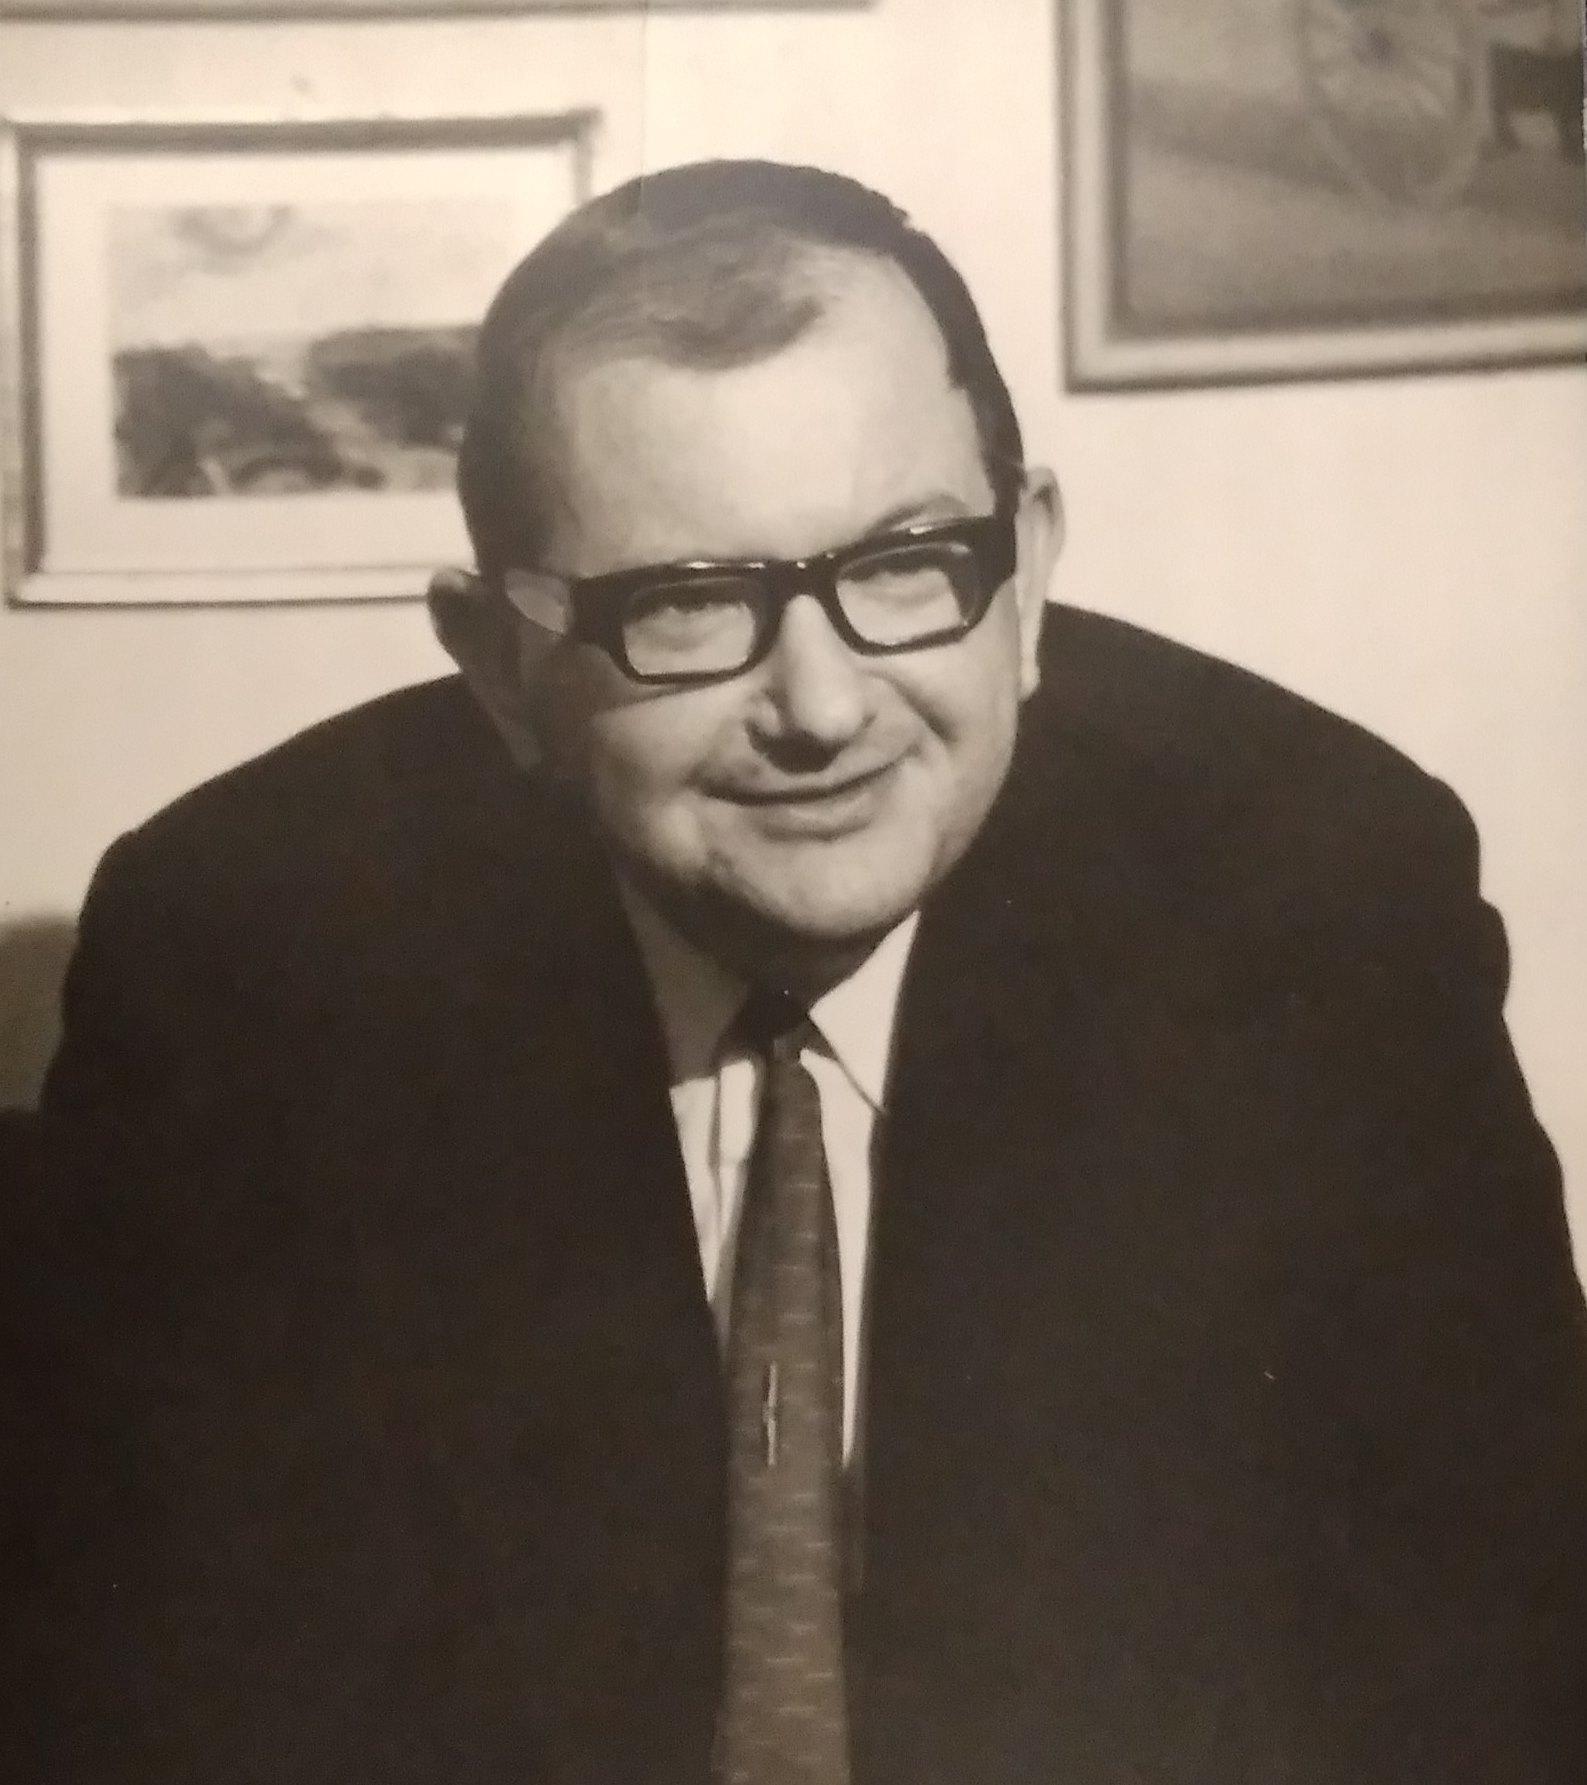 Jan Trefulka